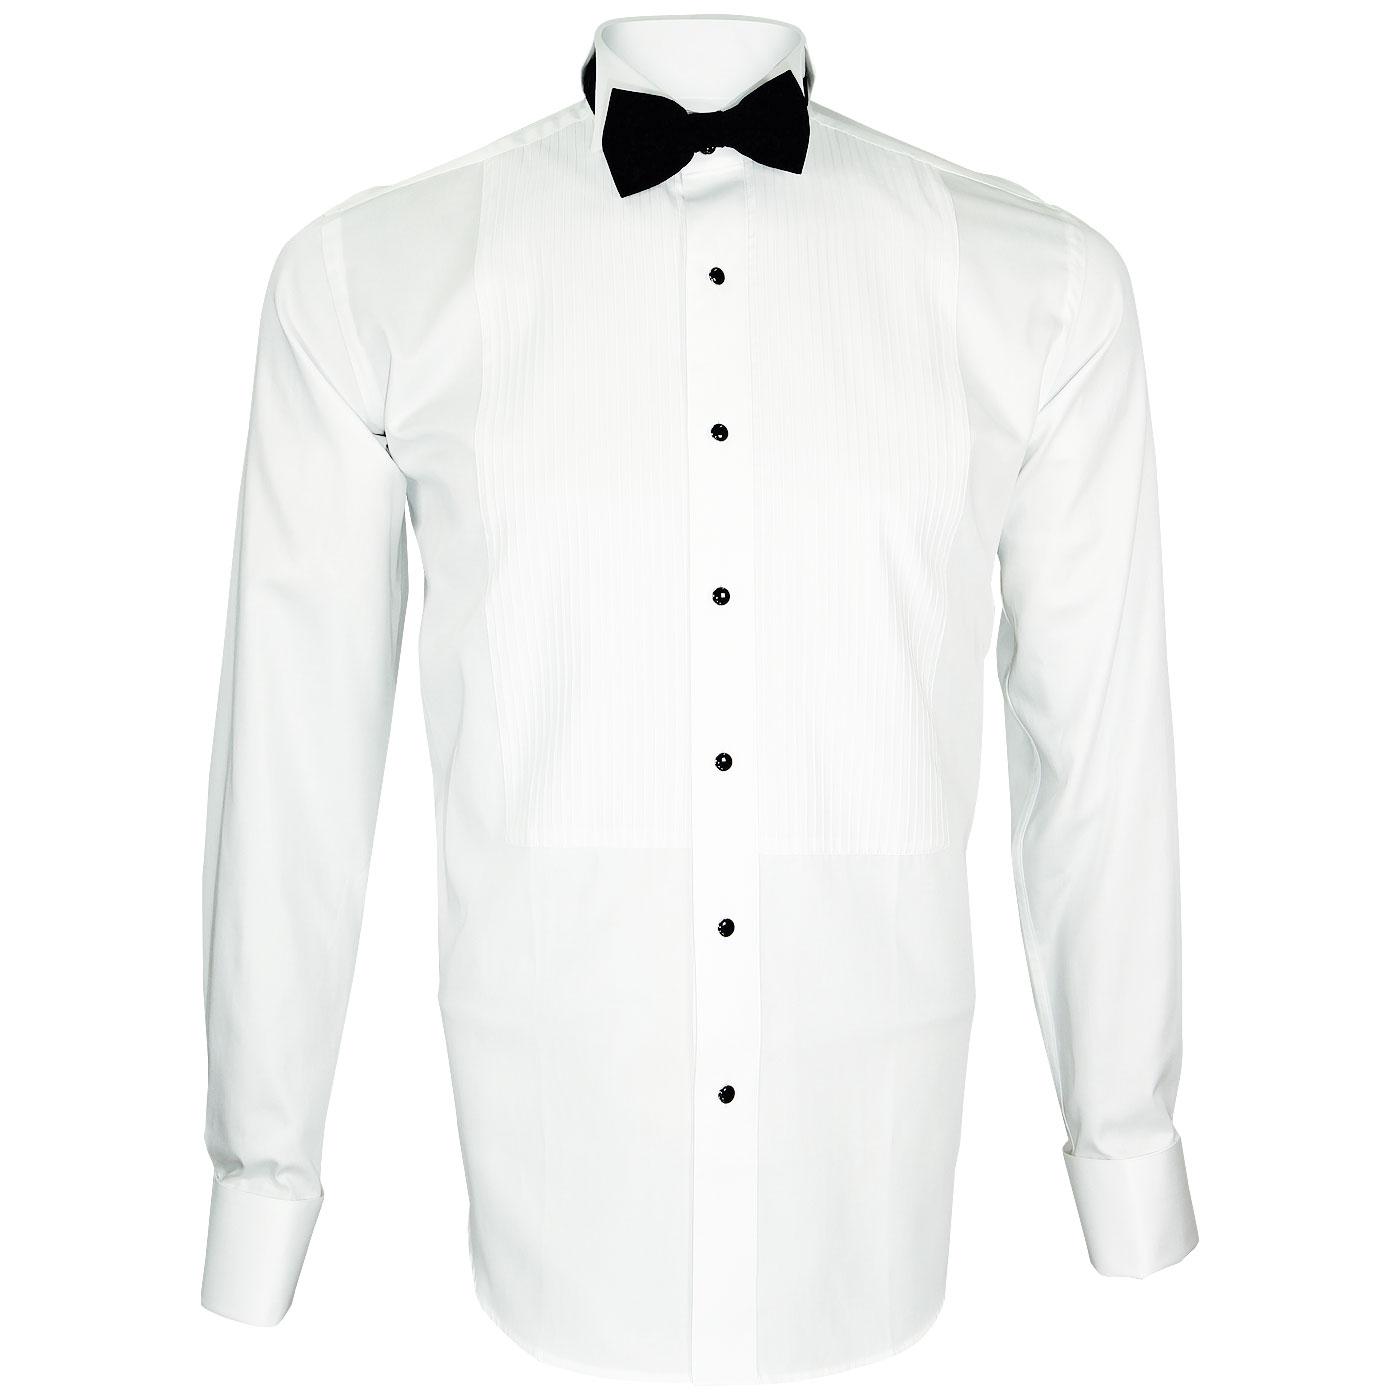 camisa cuello pajarita la camisa de vestir para esmoquin. Black Bedroom Furniture Sets. Home Design Ideas